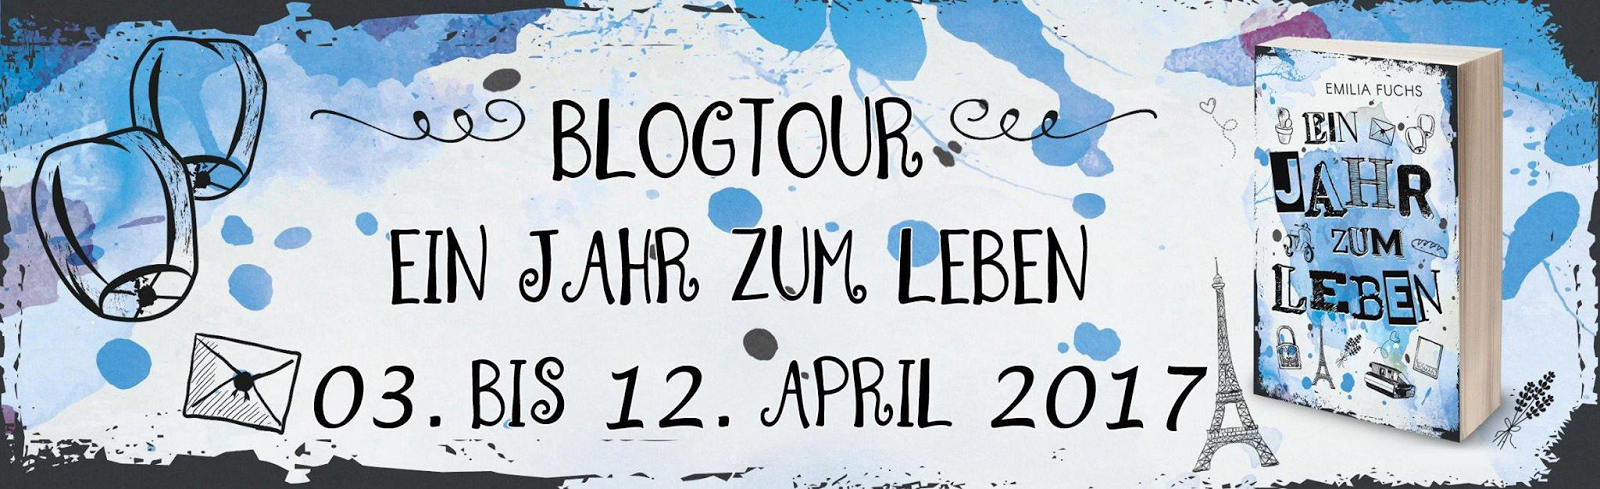 Blogtour 03.04. - 12.04.2017